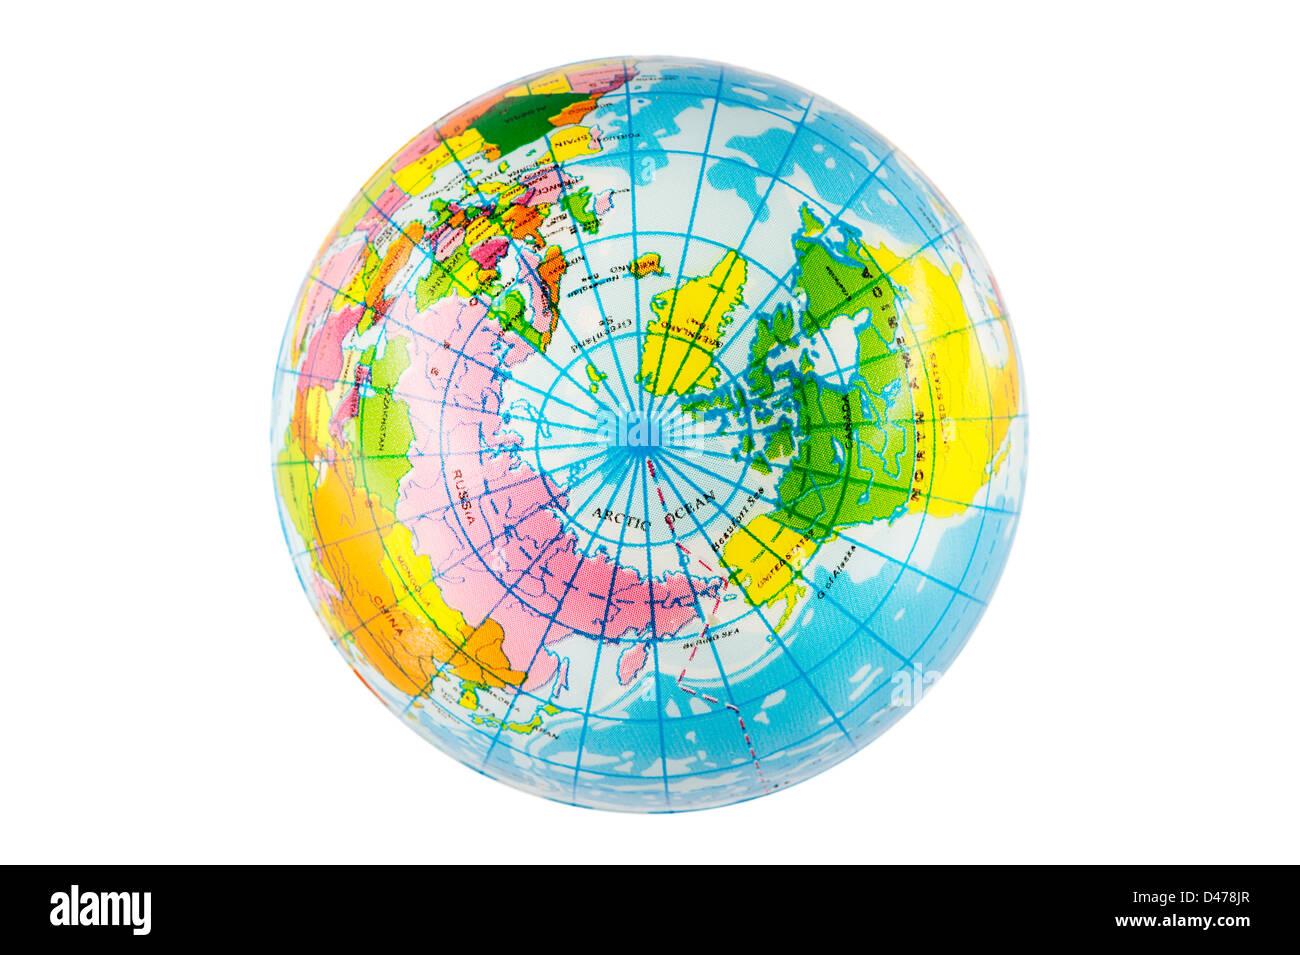 Northern hemisphere view of plastic toy globe ball. - Stock Image